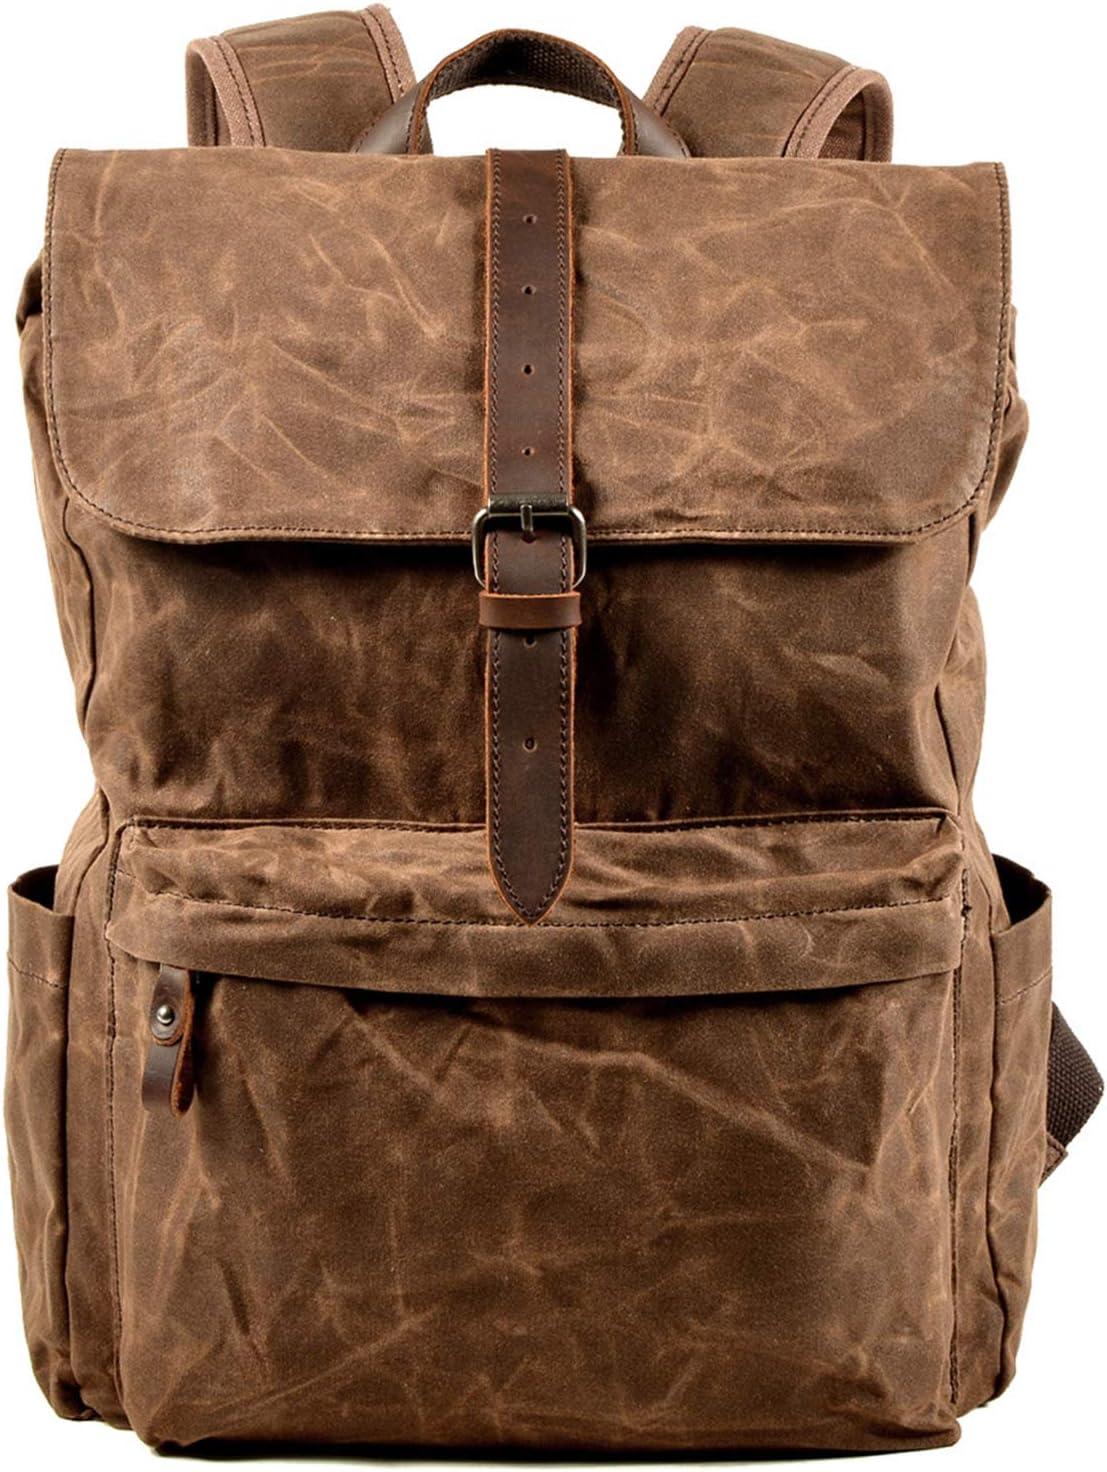 D1080 Black IBLUE Men Travel Canvas Backpack Women Laptop School Bag Heavy Duty Shoulder Rucksack for Hiking Camping